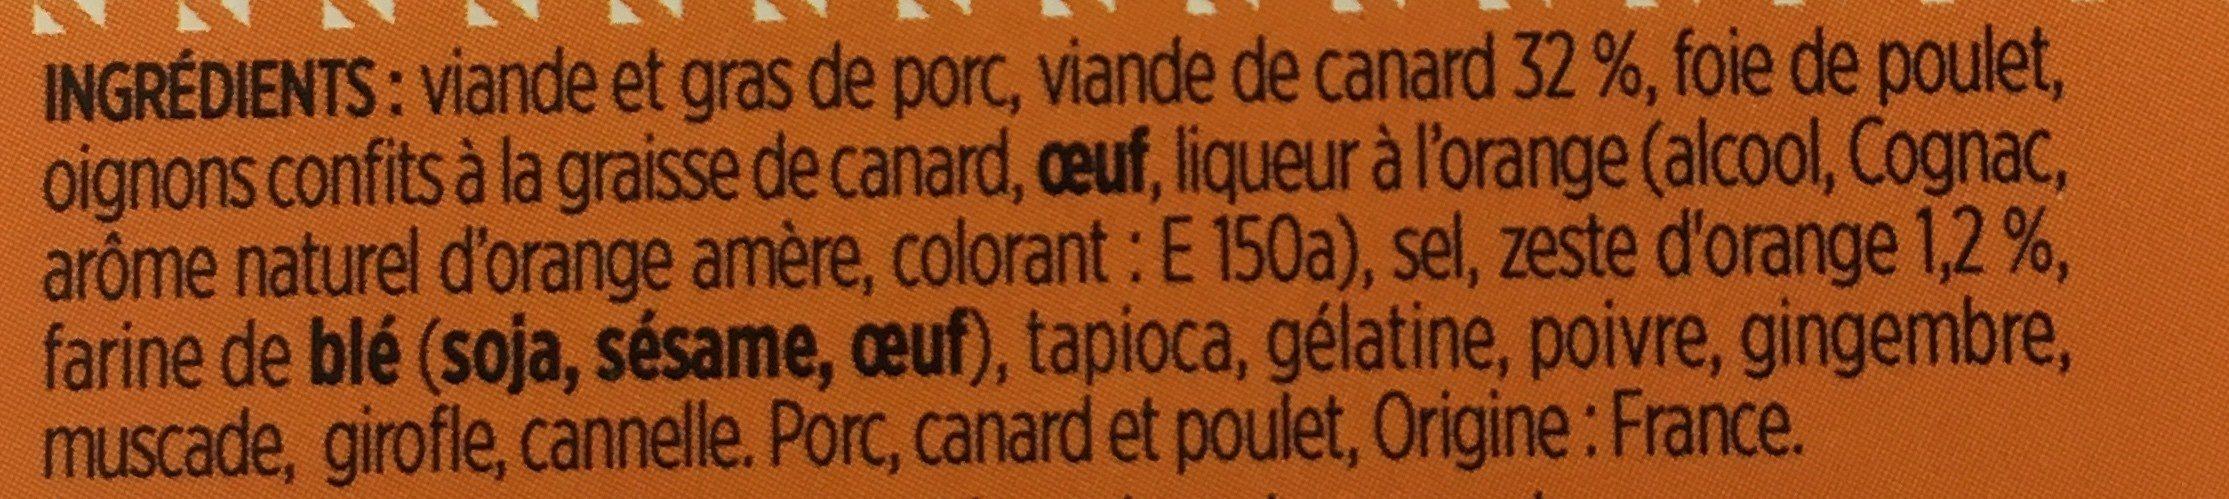 Terrine de canard à l'orange - Ingrediënten